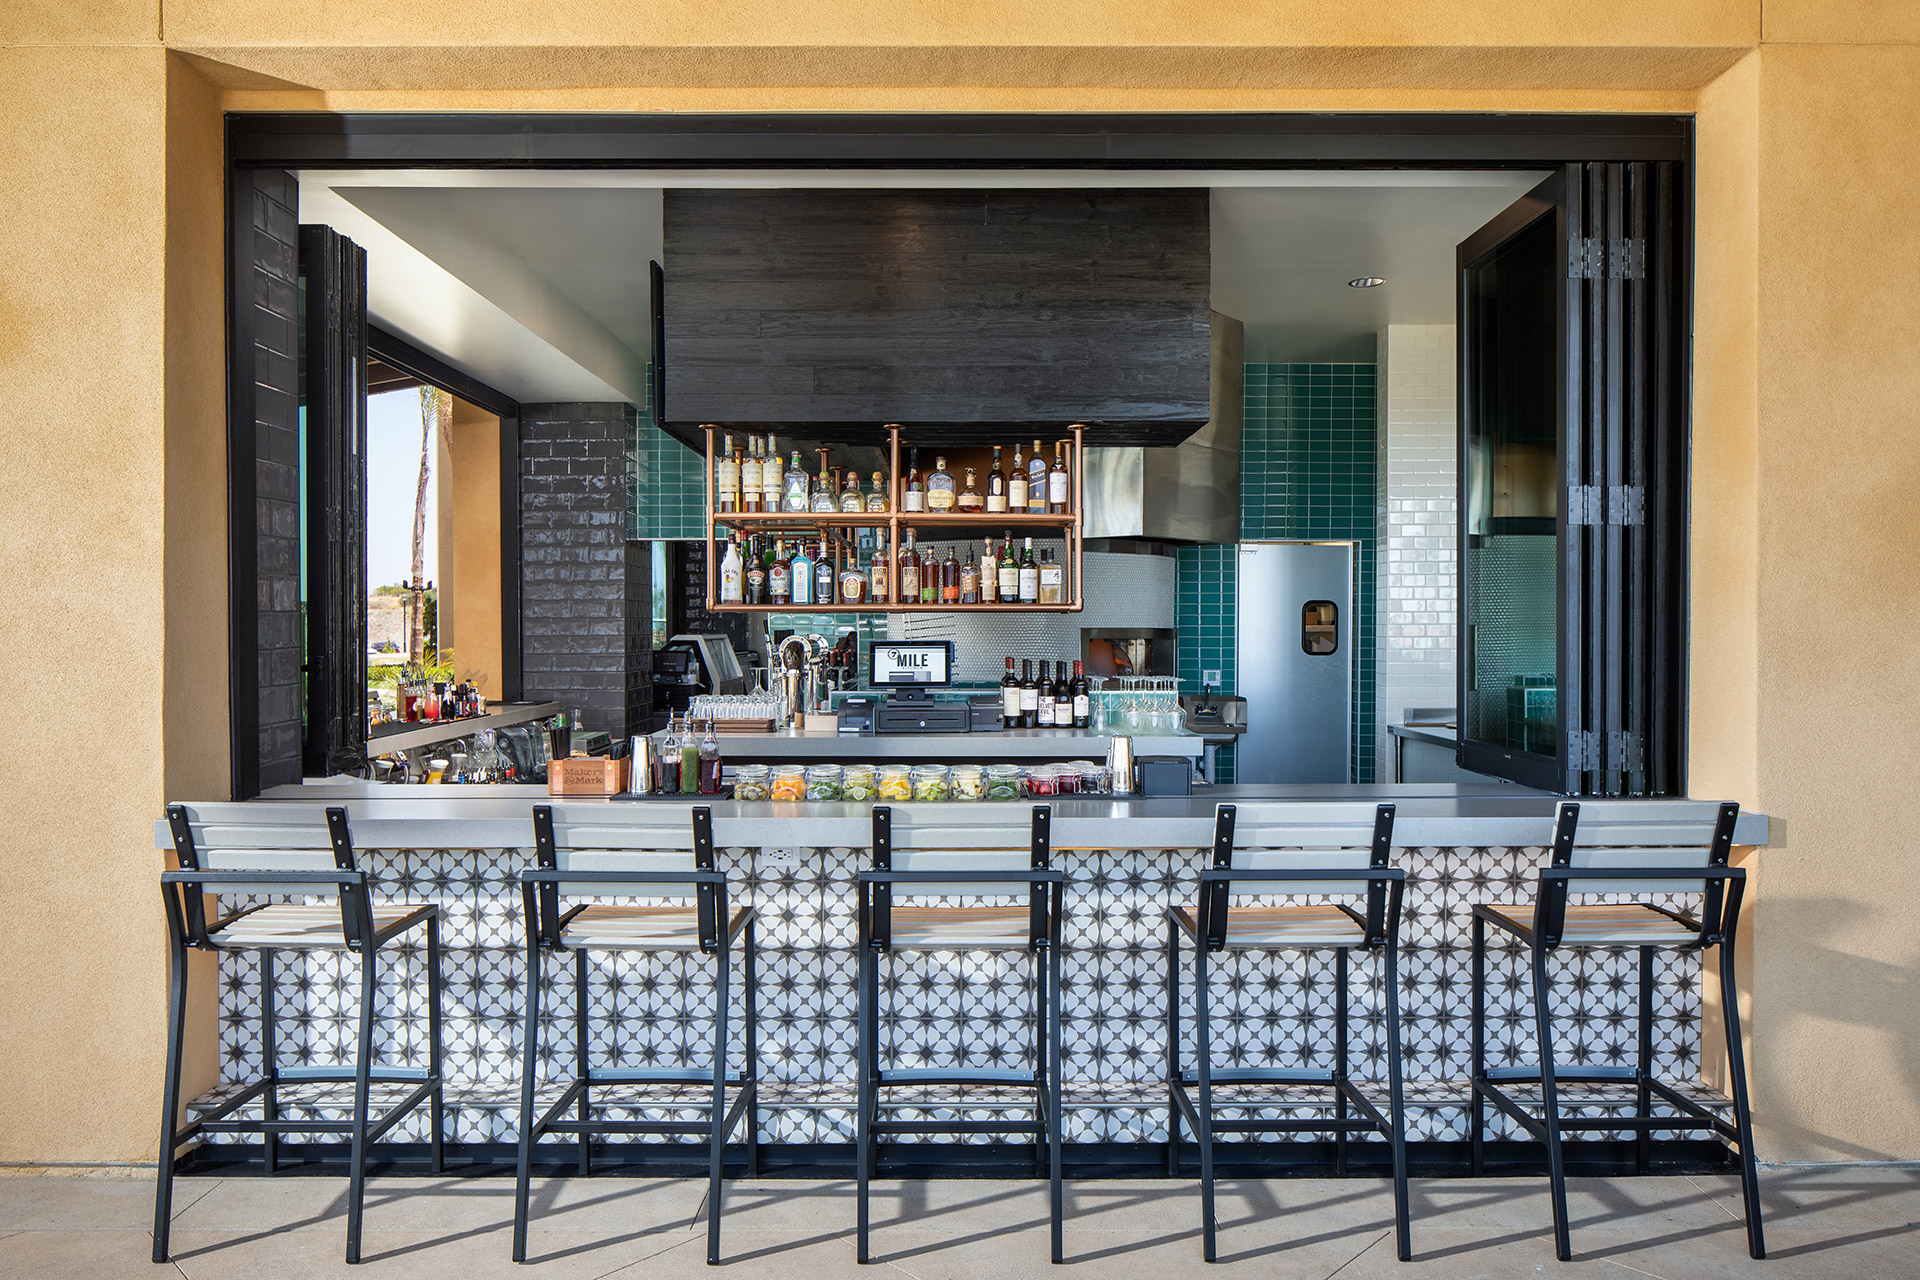 7 Mile Kitchen Bar